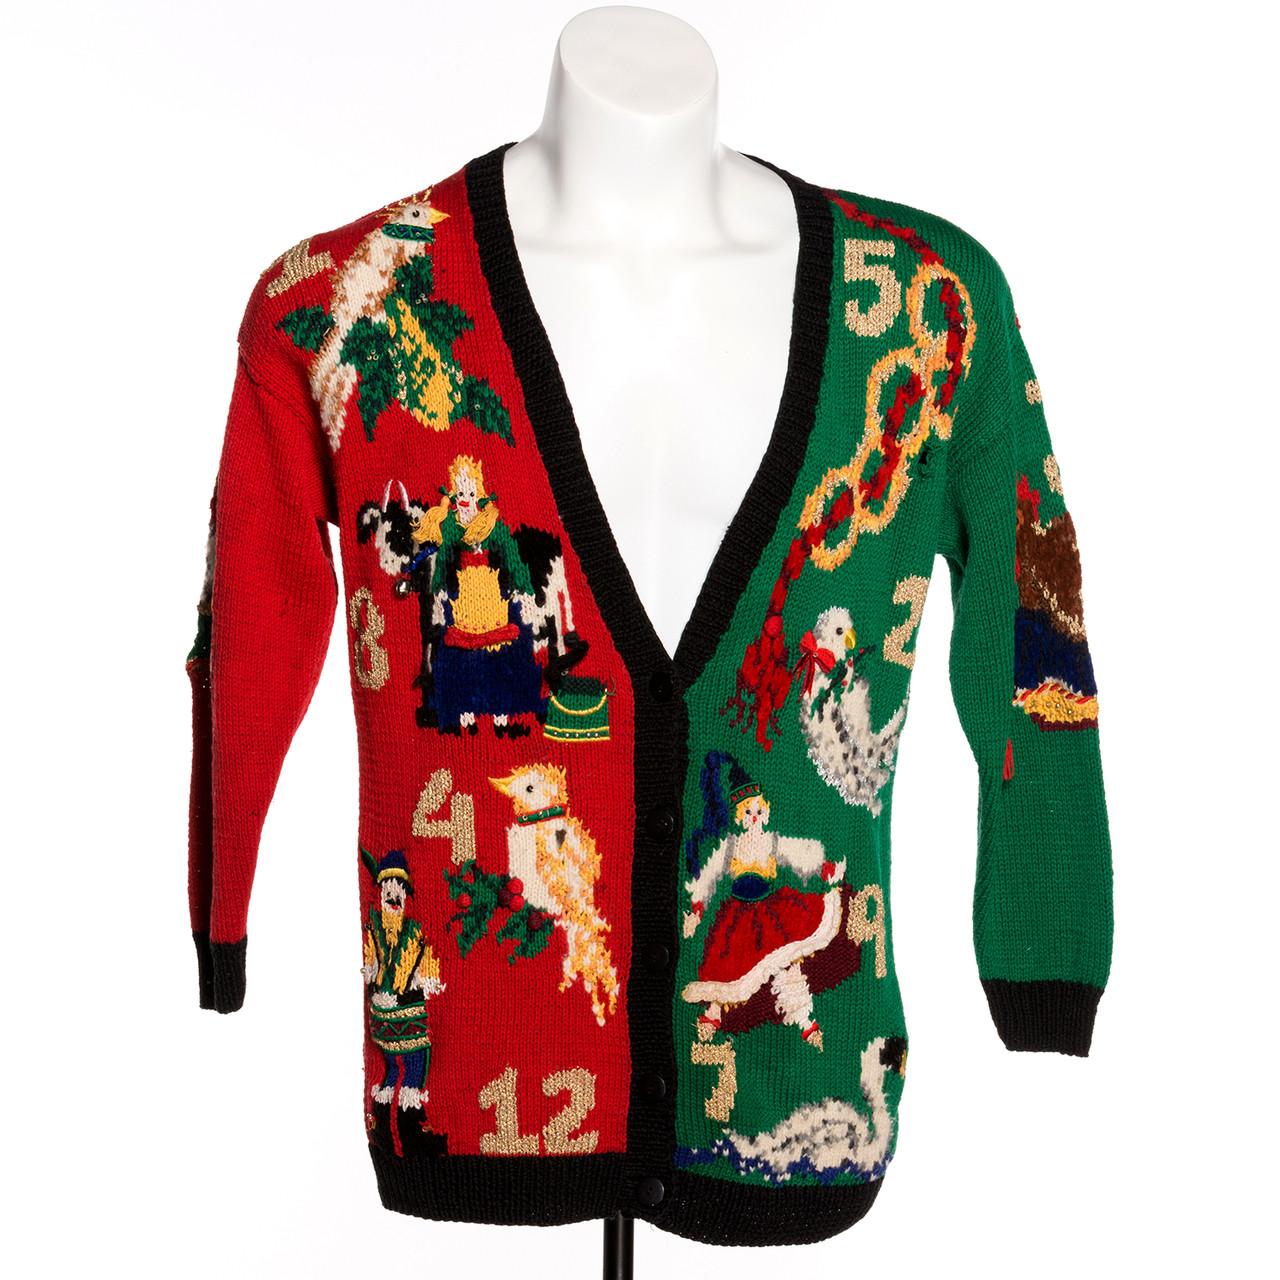 Twelve Days of Christmas Vintage Ugly Sweater